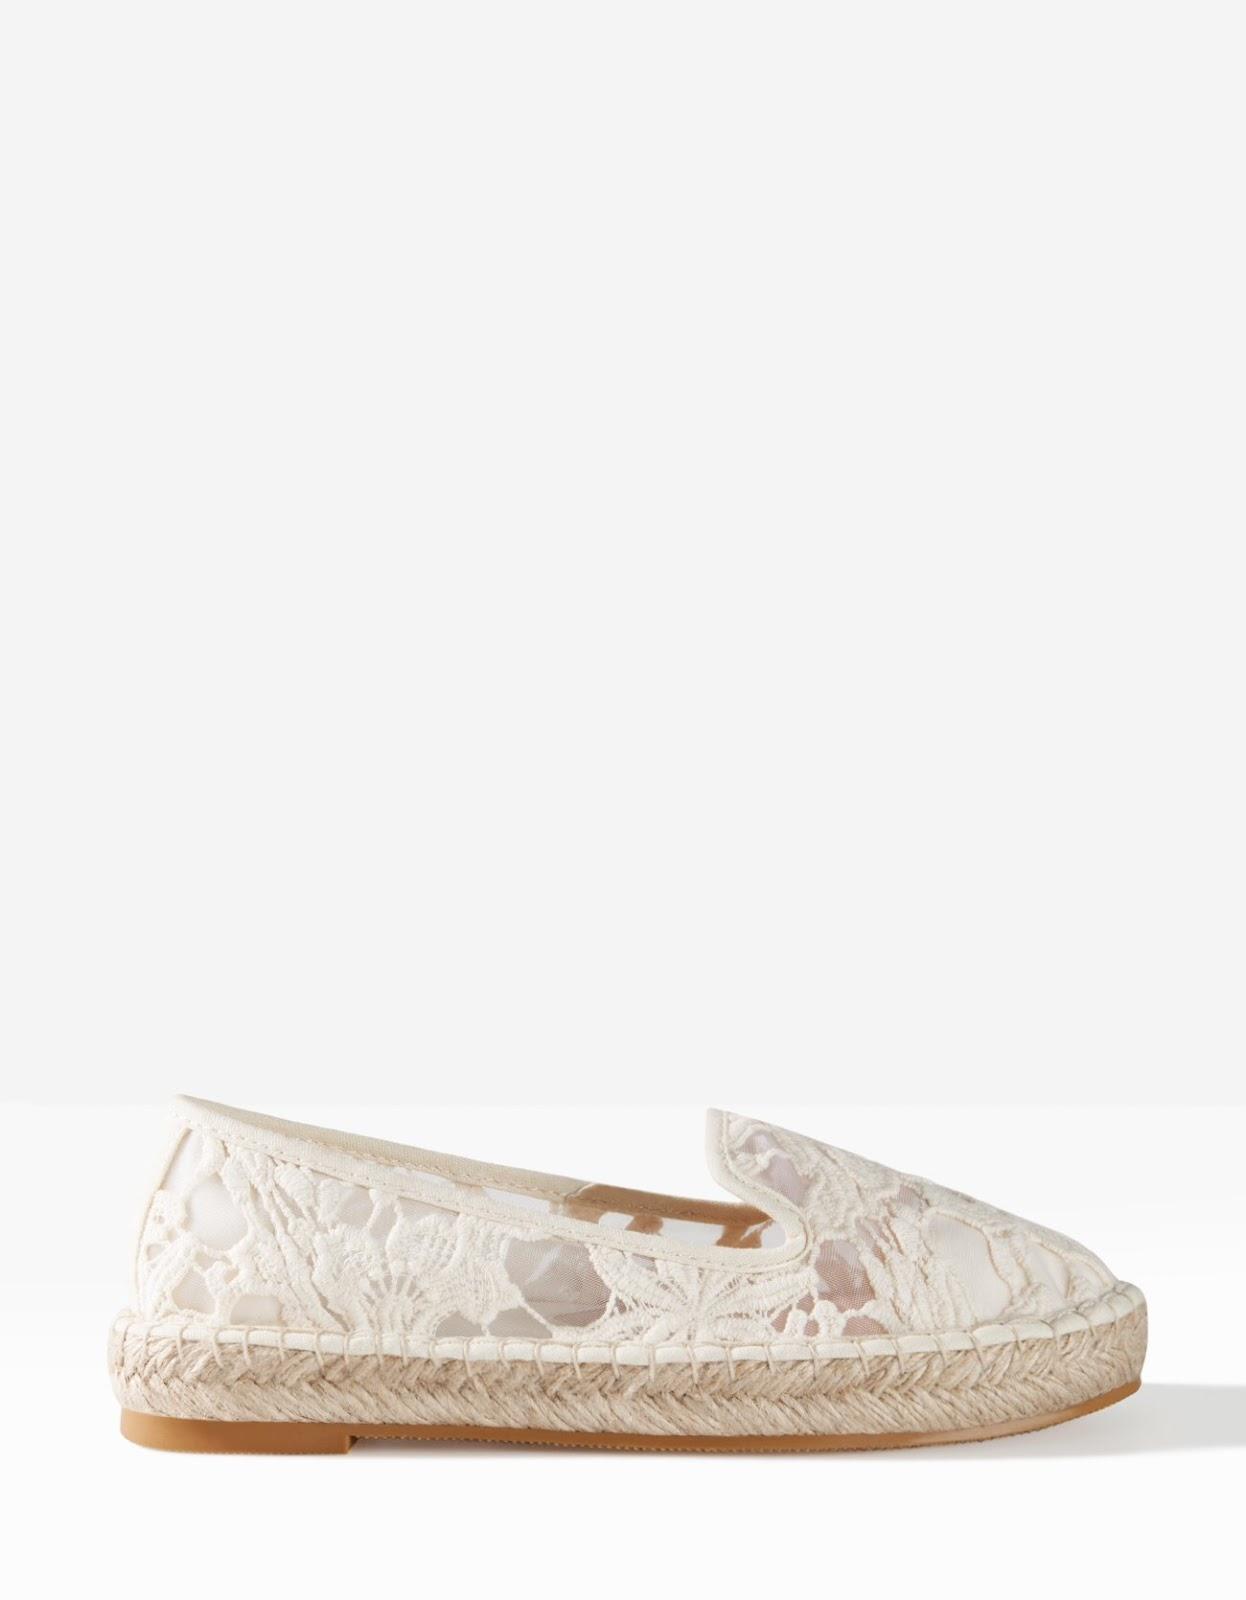 Top_zapatos_para_este_verano_2015_The_Pink_Graff_012